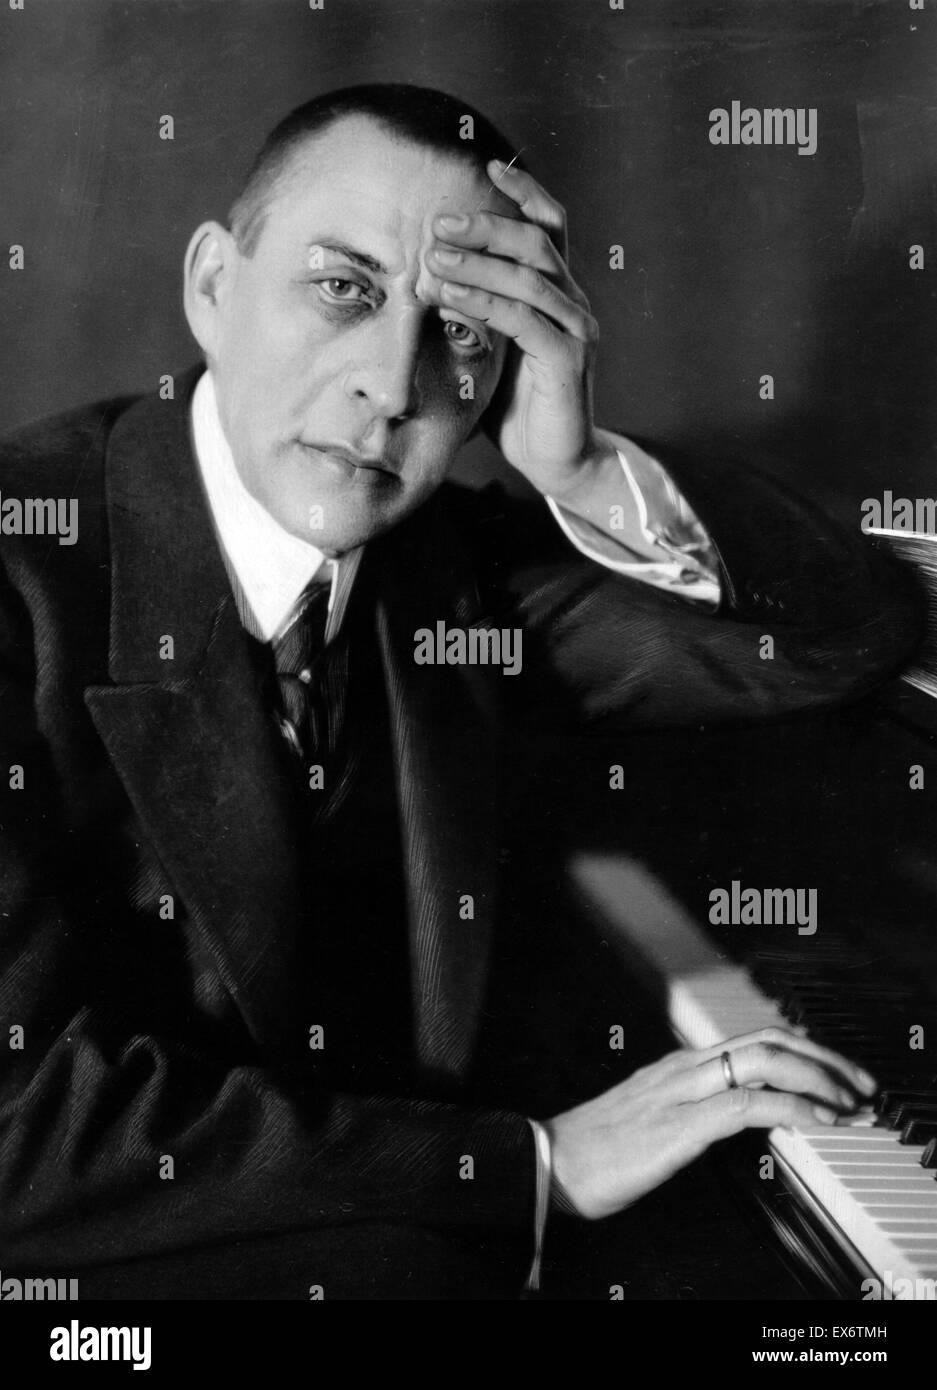 Sergei Vasilyevich Rachmaninoff (1873 – 1943). Russian composer, pianist, and conductor. - Stock Image